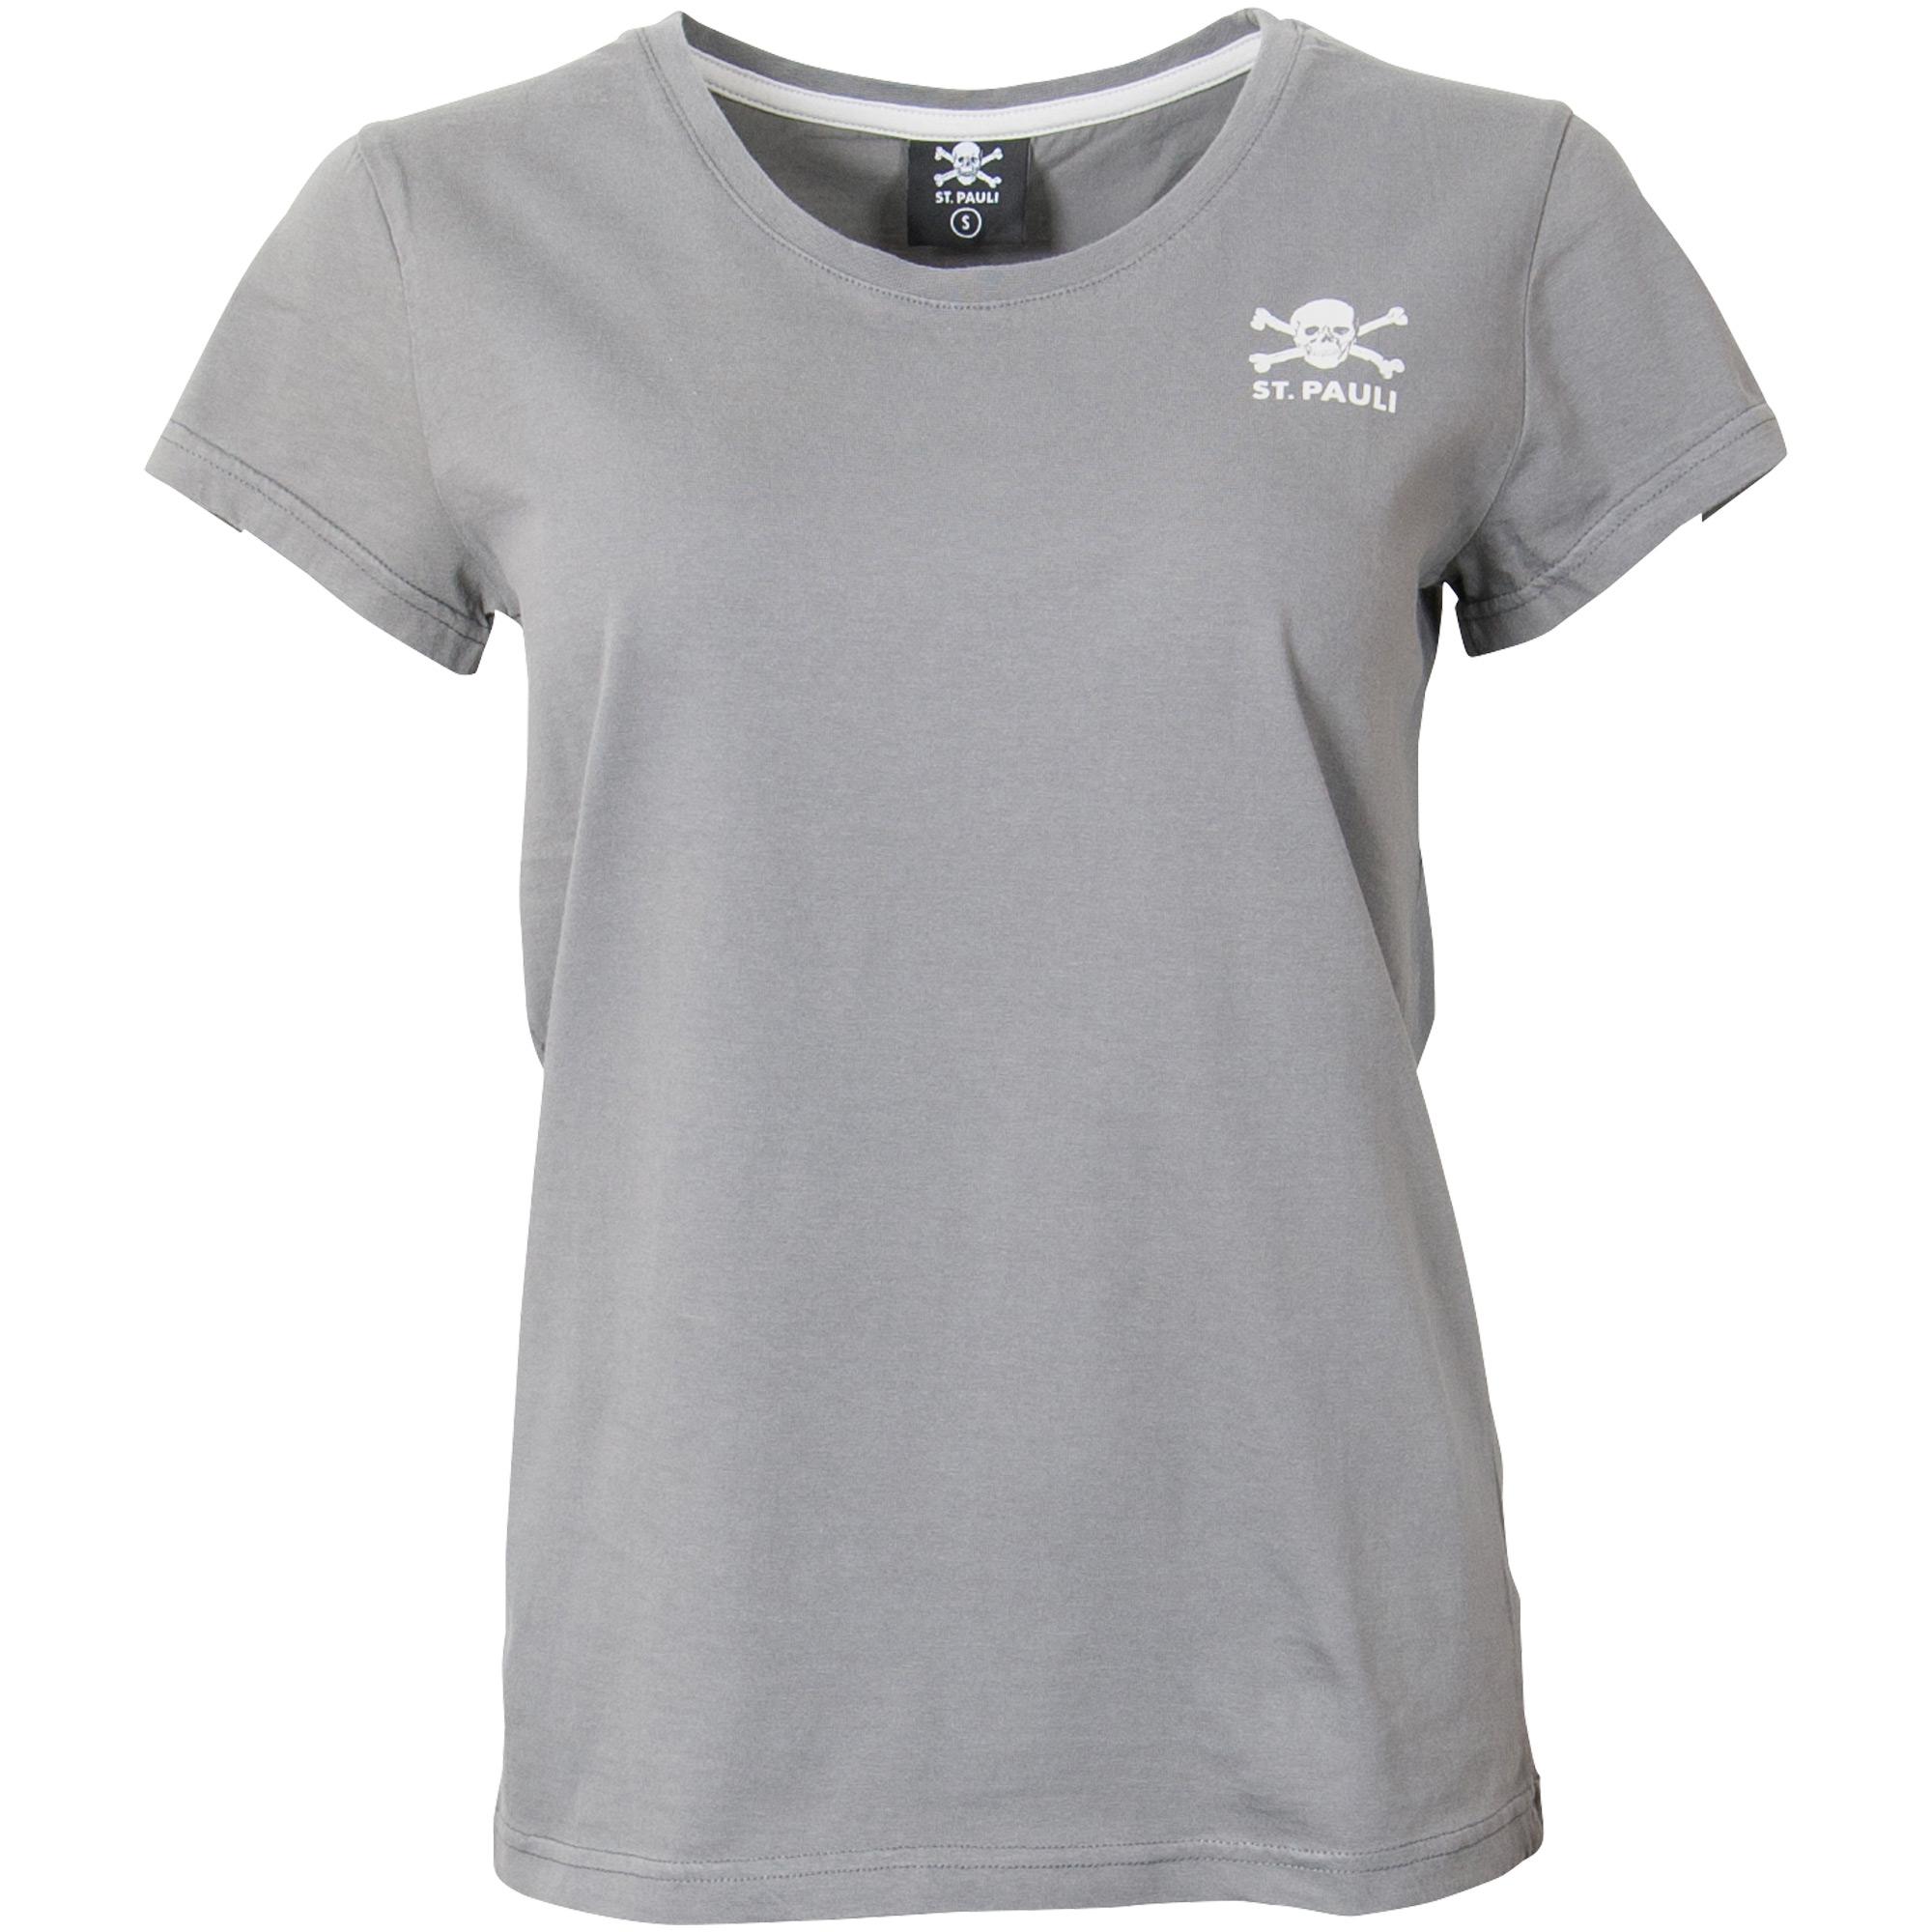 FC St. Pauli - Damen T-Shirt FCSP - grau